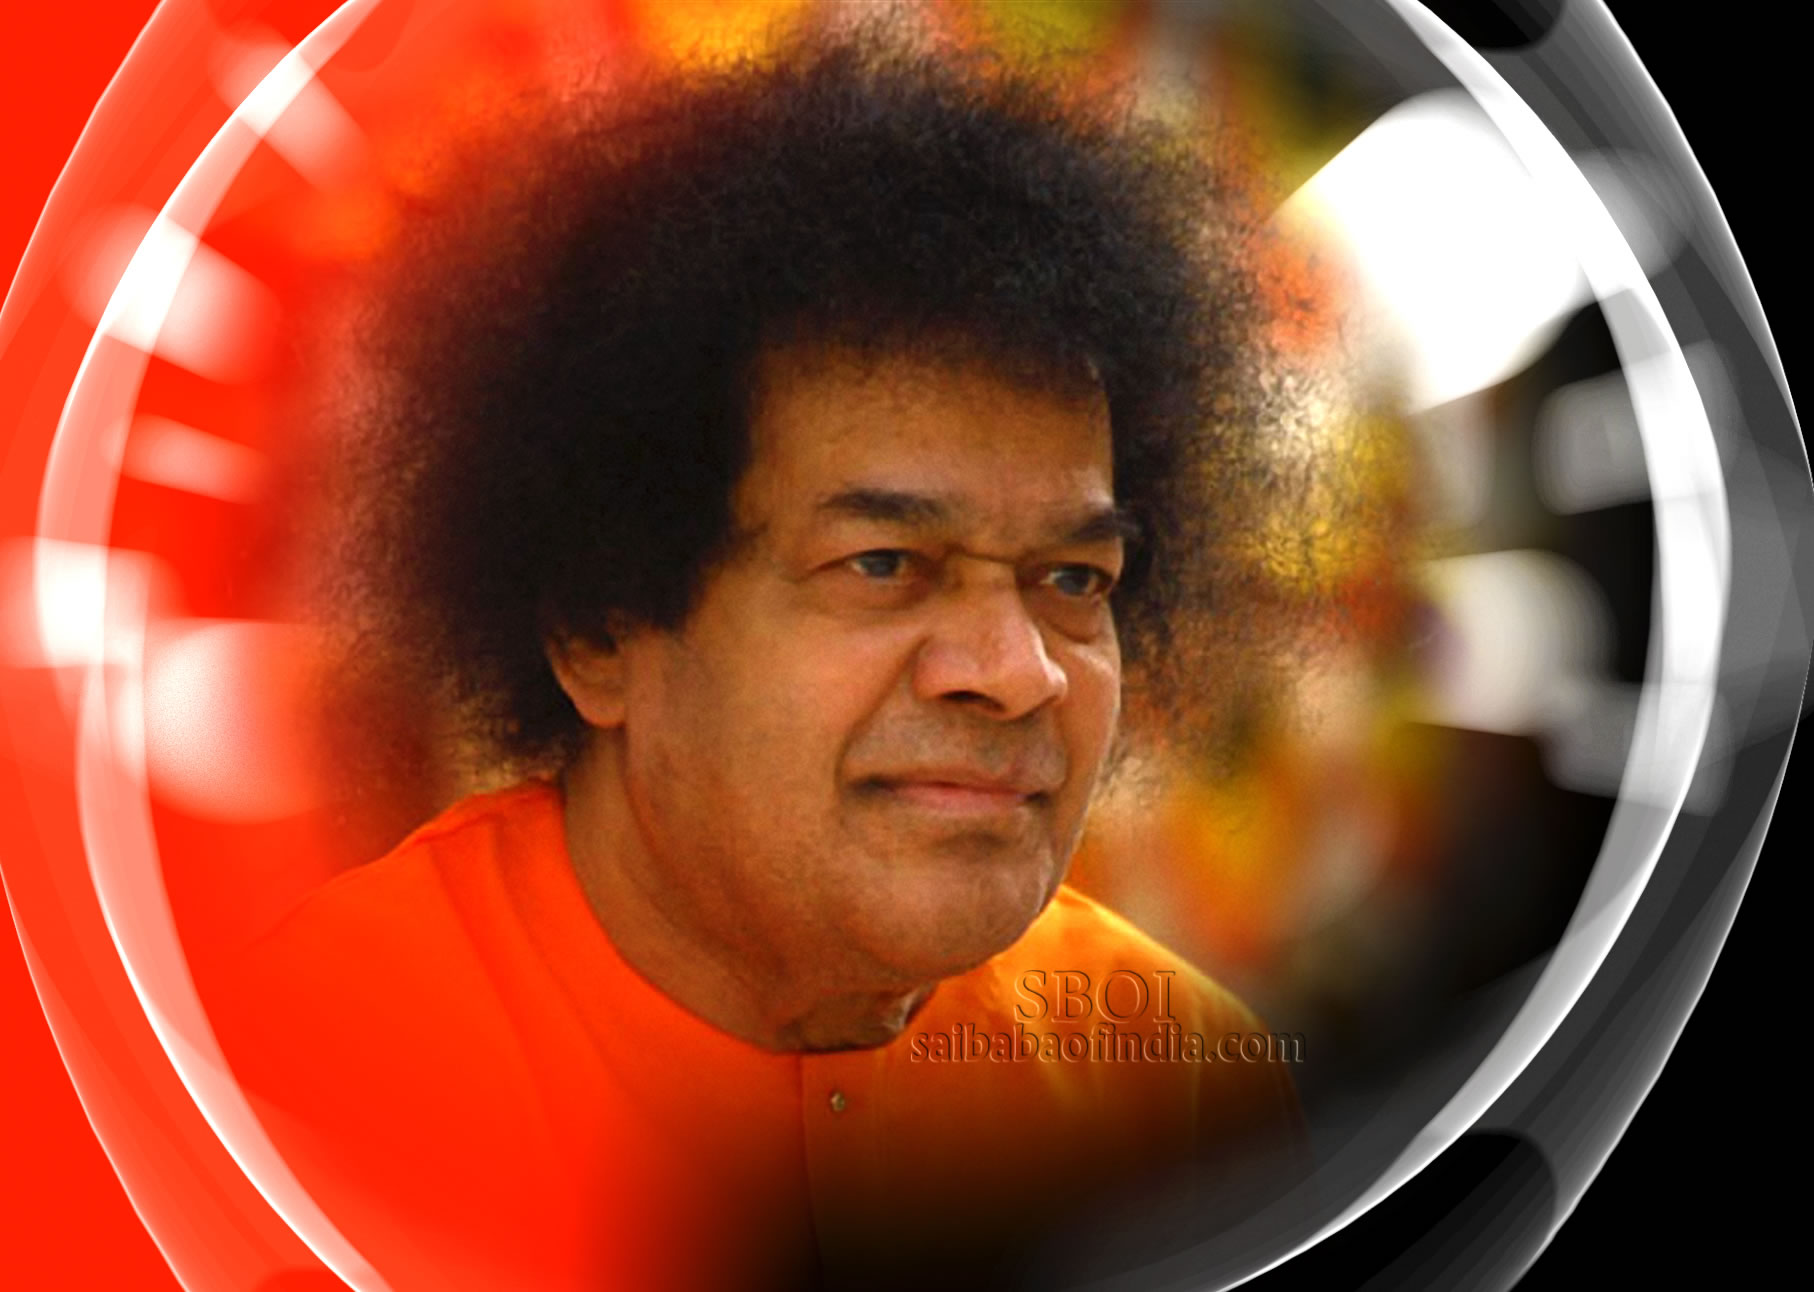 Sri Sathya Sai Baba Wallpapers Photos Free Download Computer